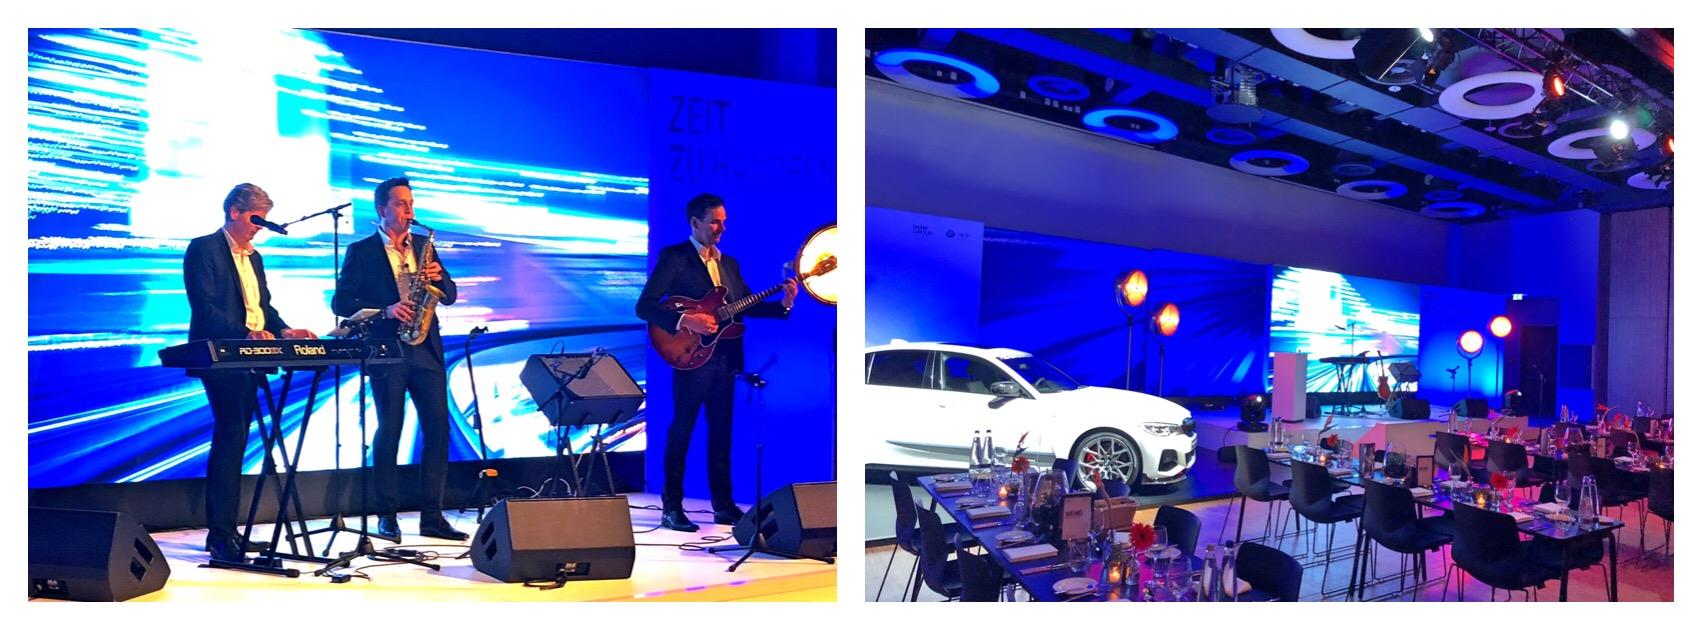 Liveband-Muenchen-BMW